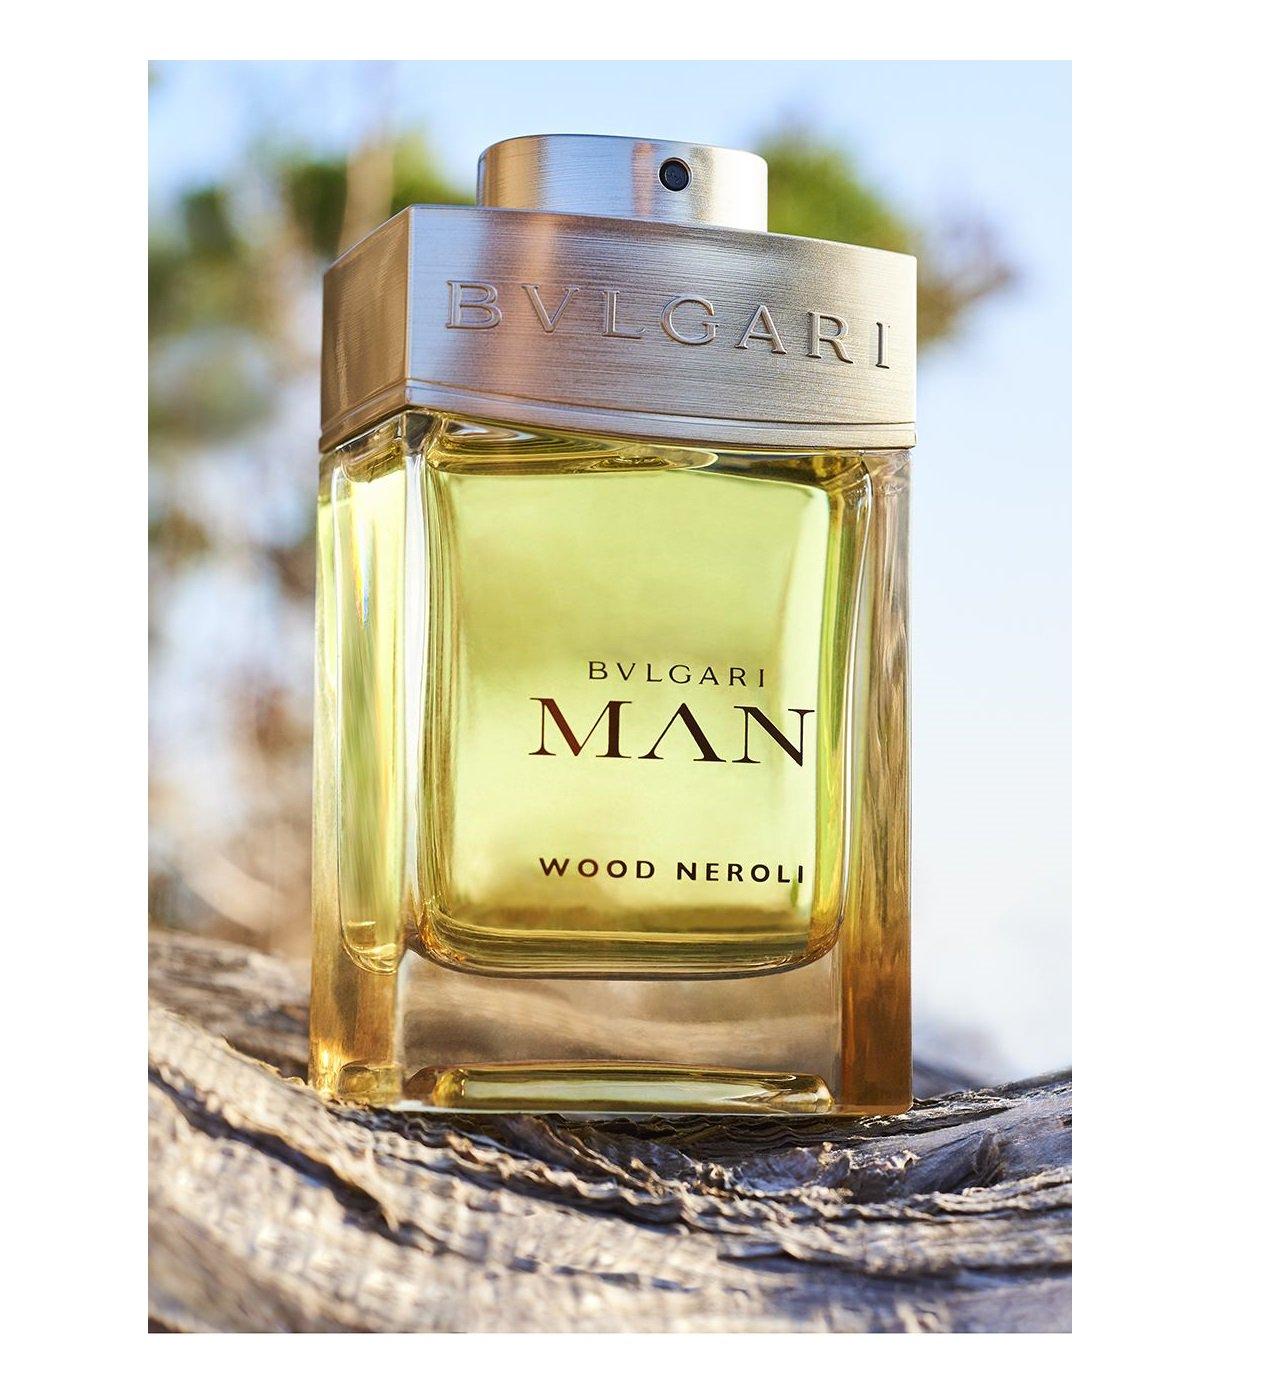 Bvlgari Man Wood Neroli E684CFD8-9A45-46B7-8790-3852ECEDE56D.jpeg